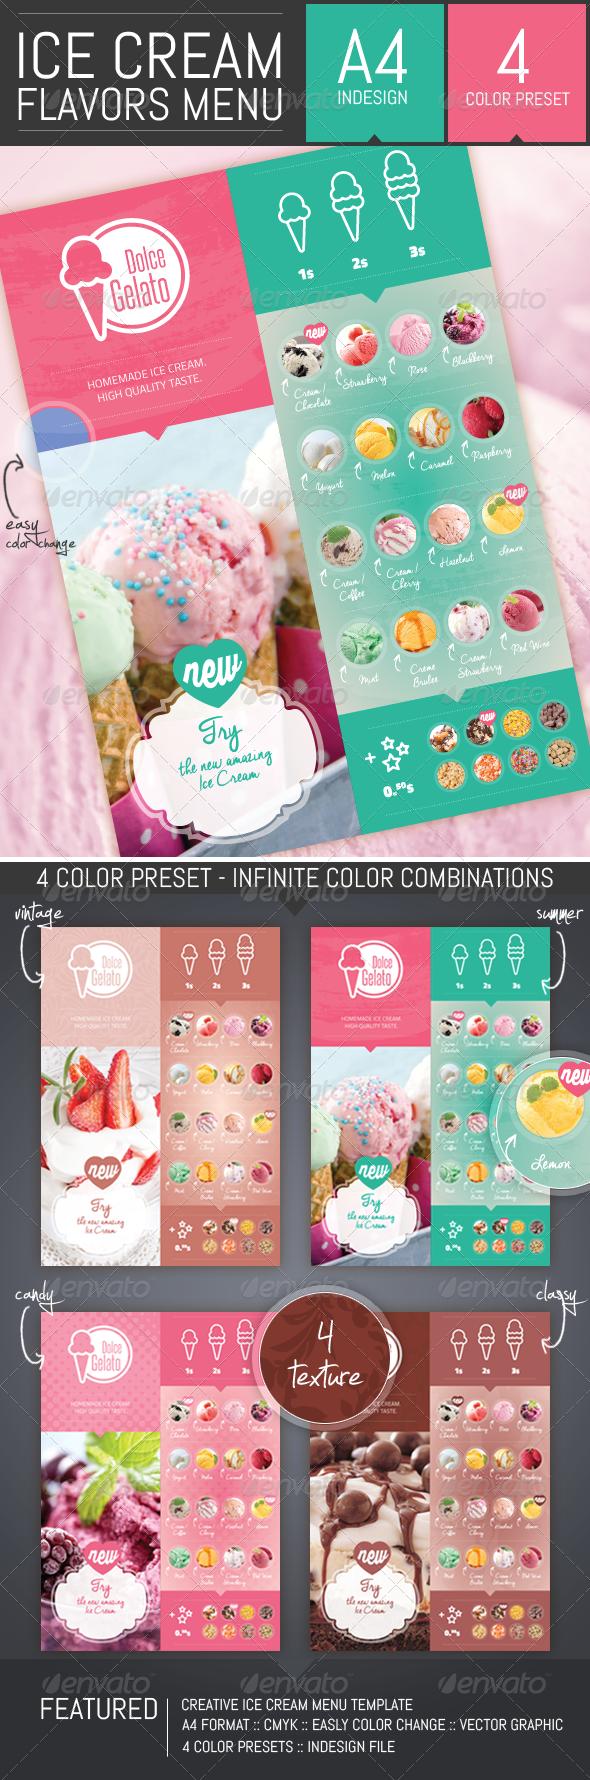 GraphicRiver Ice Cream Flavor Menu Template 8515743